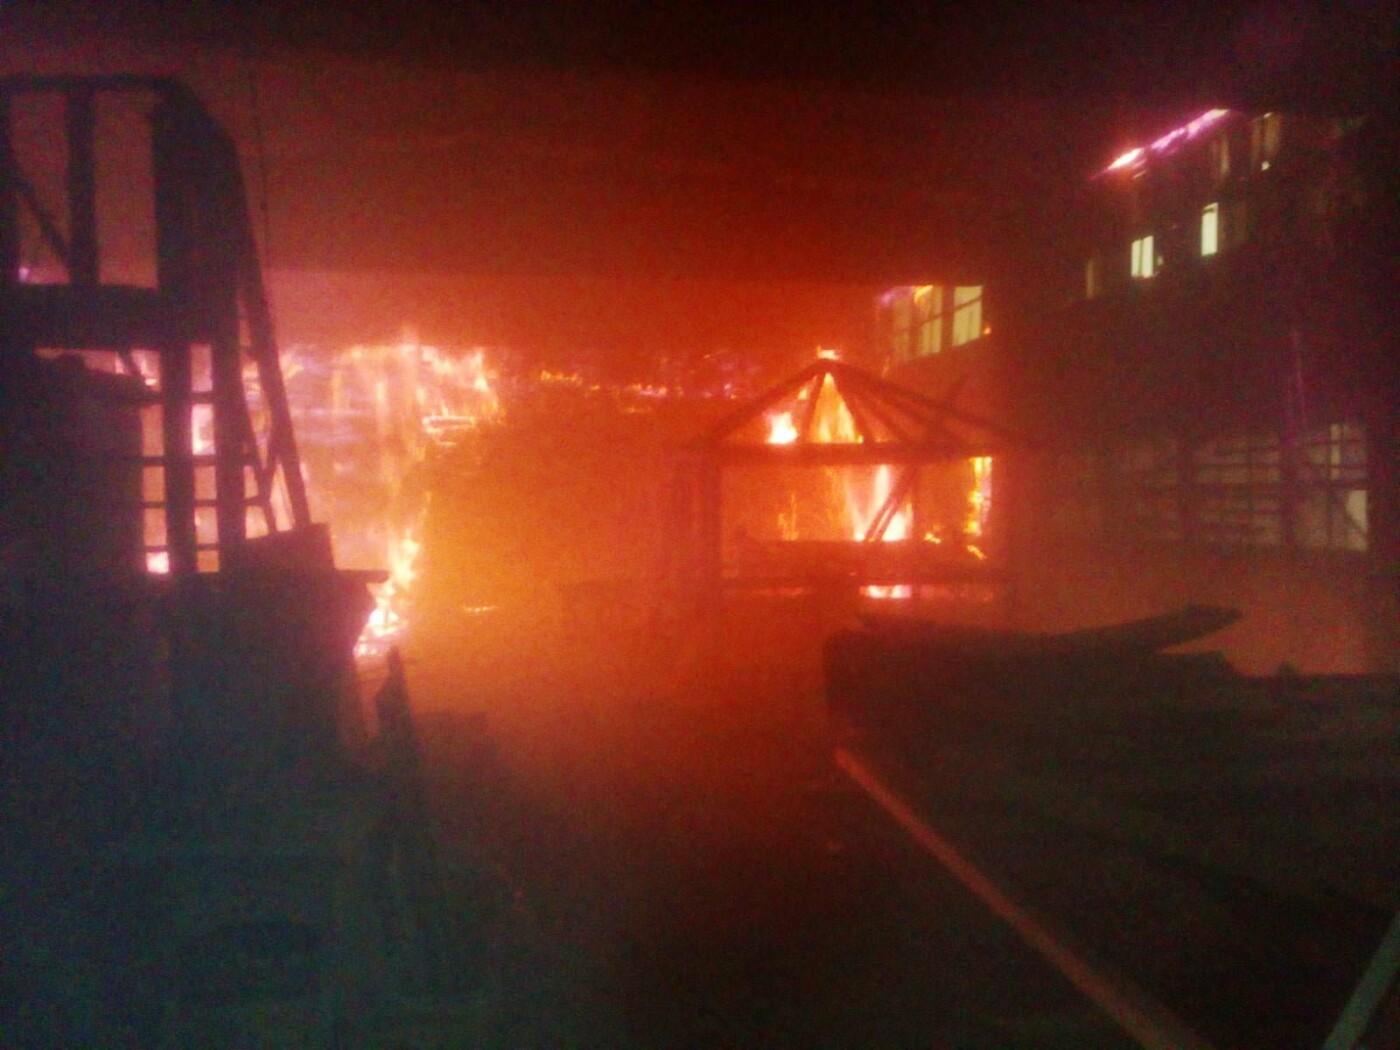 У селі Кам'янка горіла приватна господарча споруда, фото-6